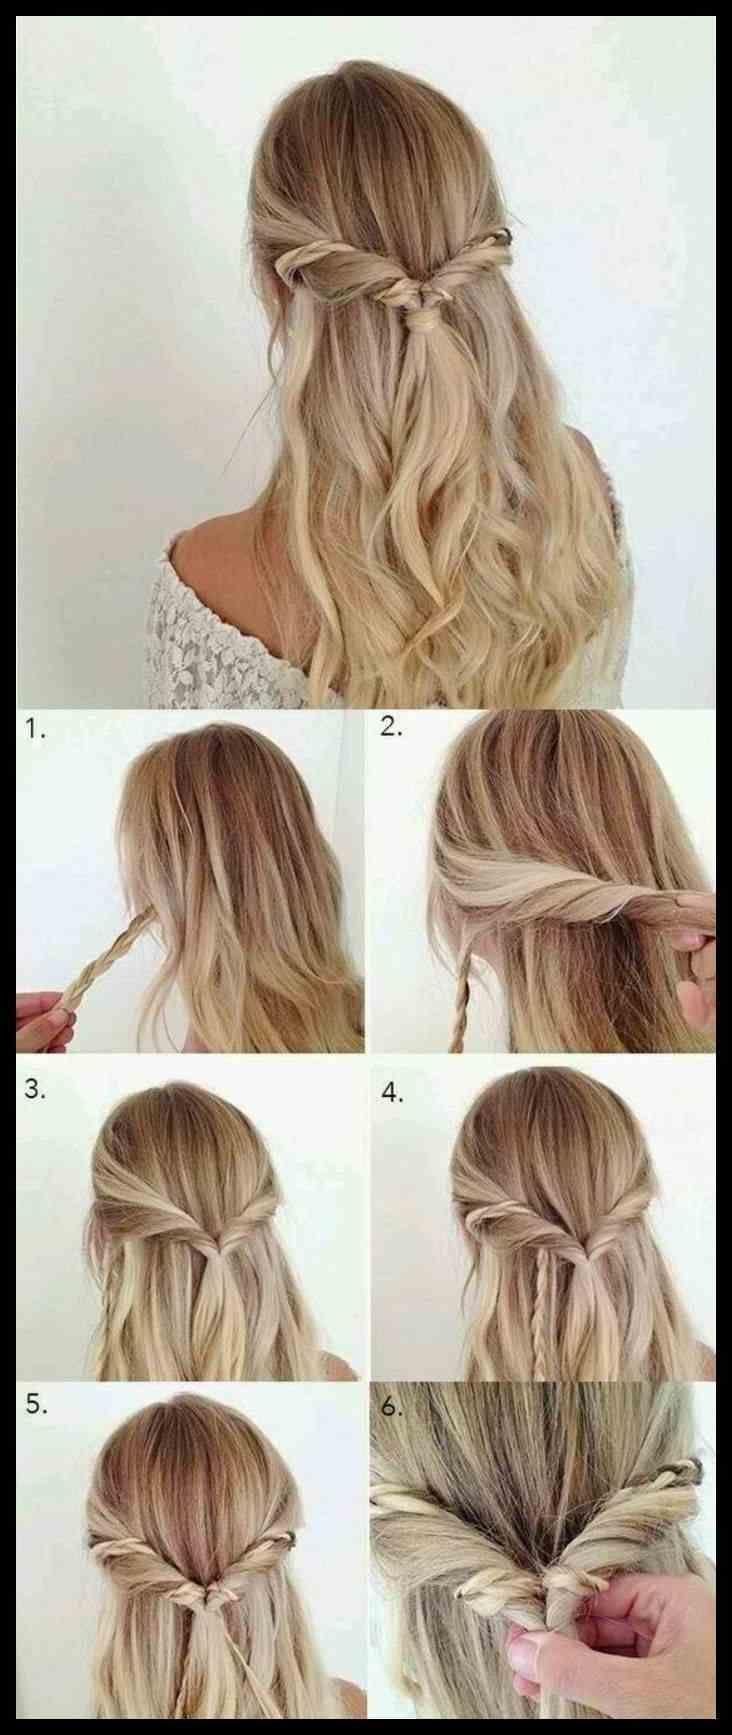 Hair Styles For School Tı 1001 + Ideas for beautiful hair styles Plus … | Lad…